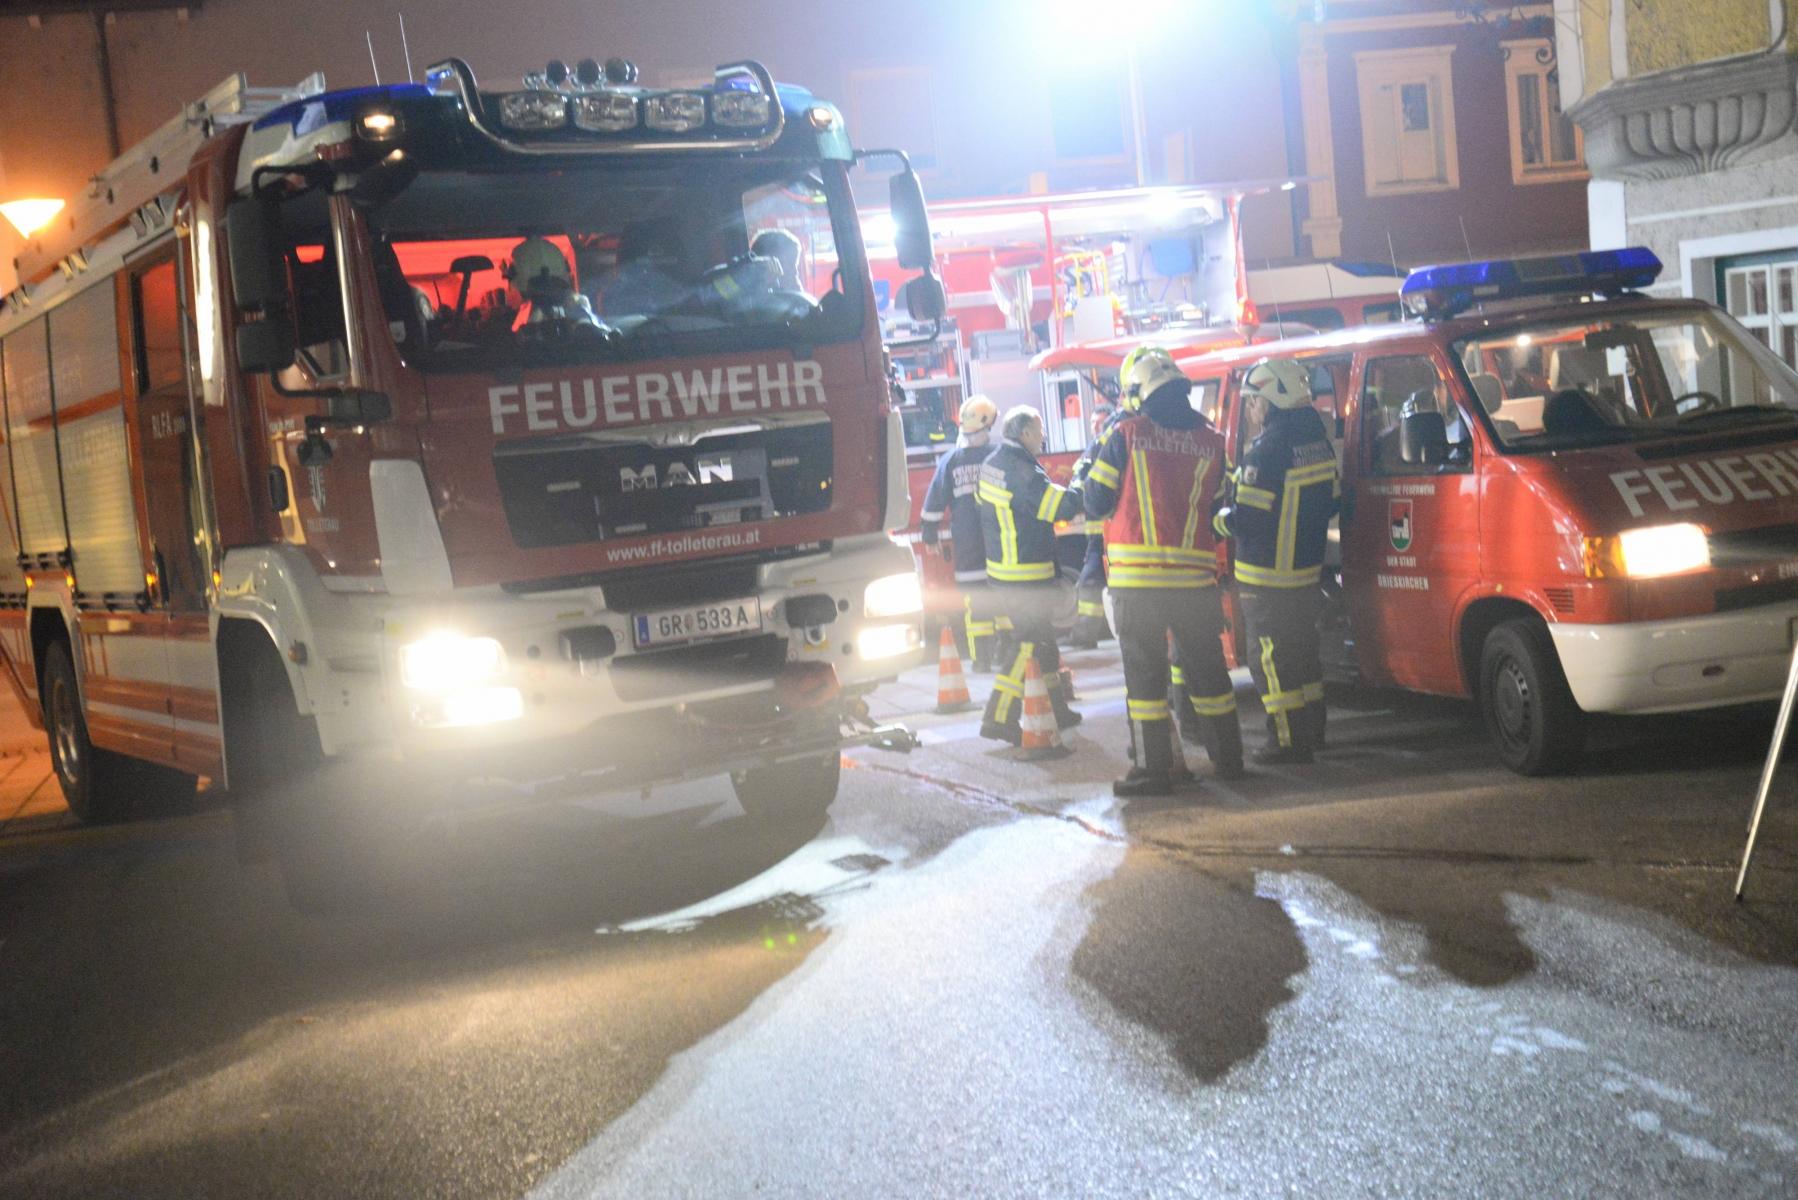 FF_Uebung_Brauerei_GR_0062